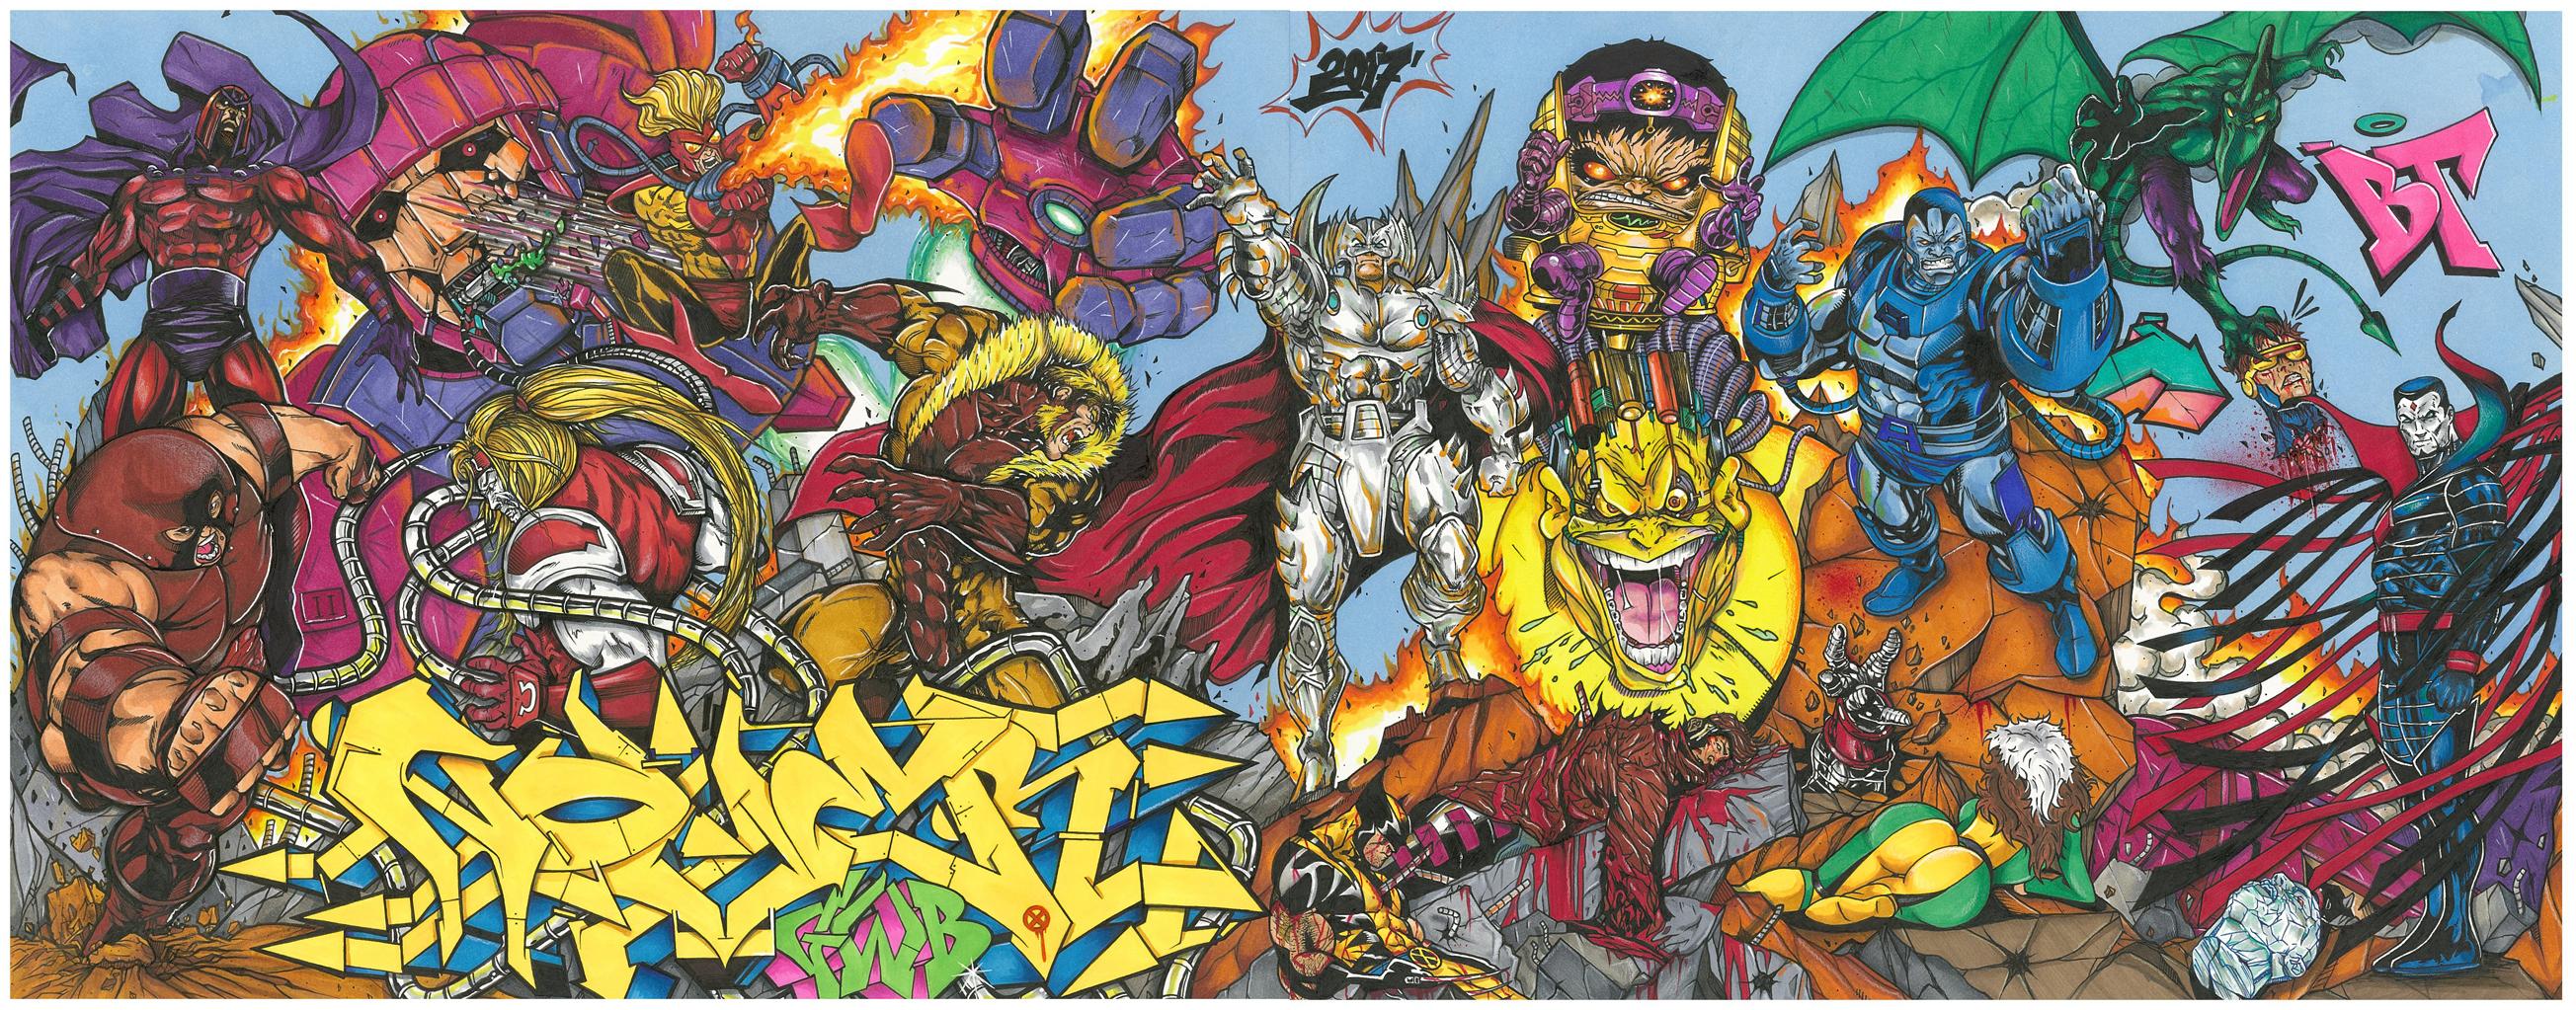 X-Men Villains by Nover, Markers & Pens on Paper, 2018.